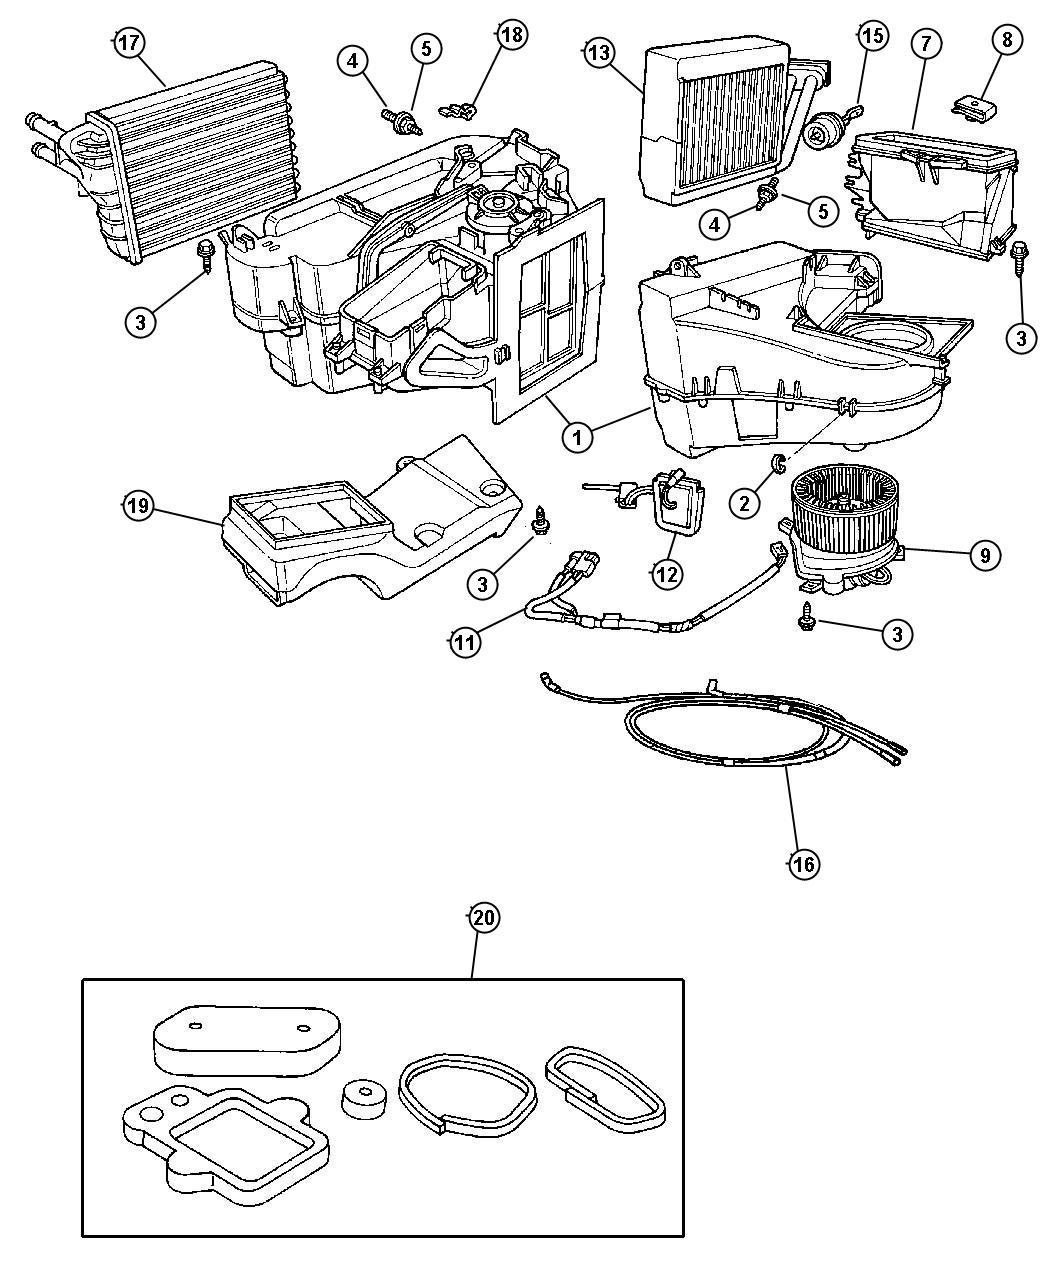 Chrysler Pt Cruiser Evaporator Air Conditioning